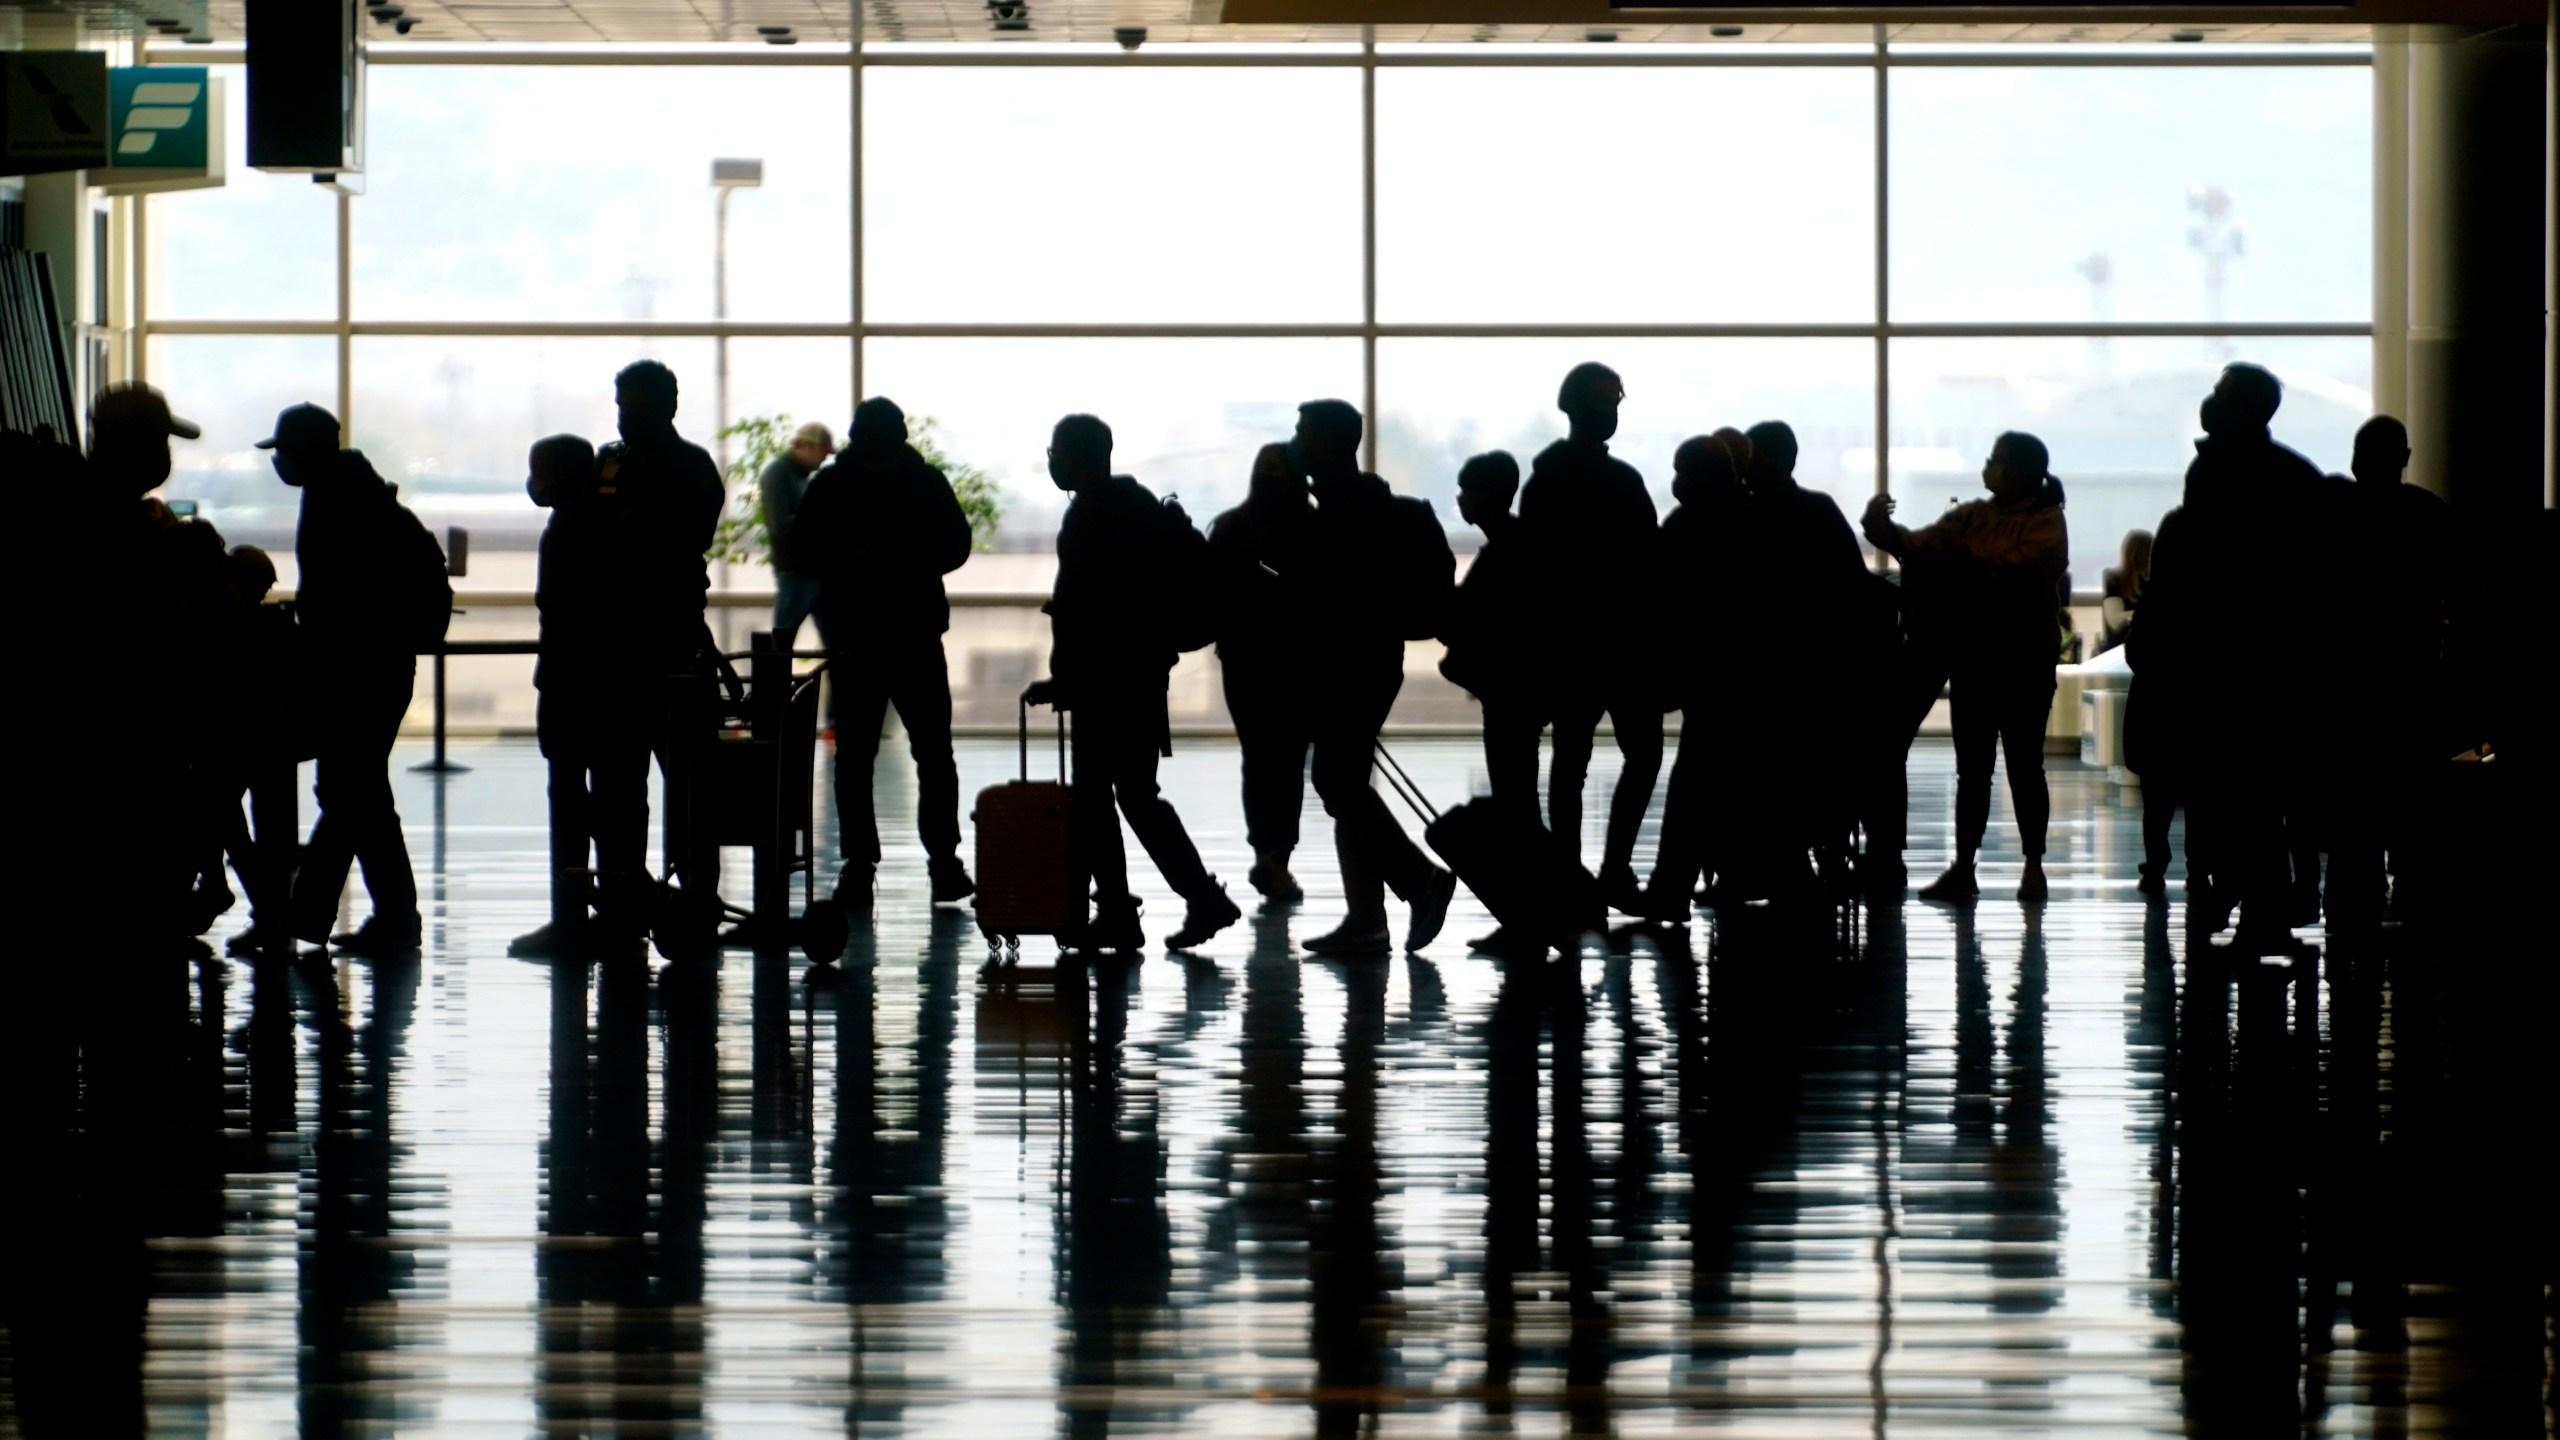 Travelers walk through the Salt Lake City International Airport in Salt Lake City on March 17, 2021. (Rick Bowmer / Associated Press)